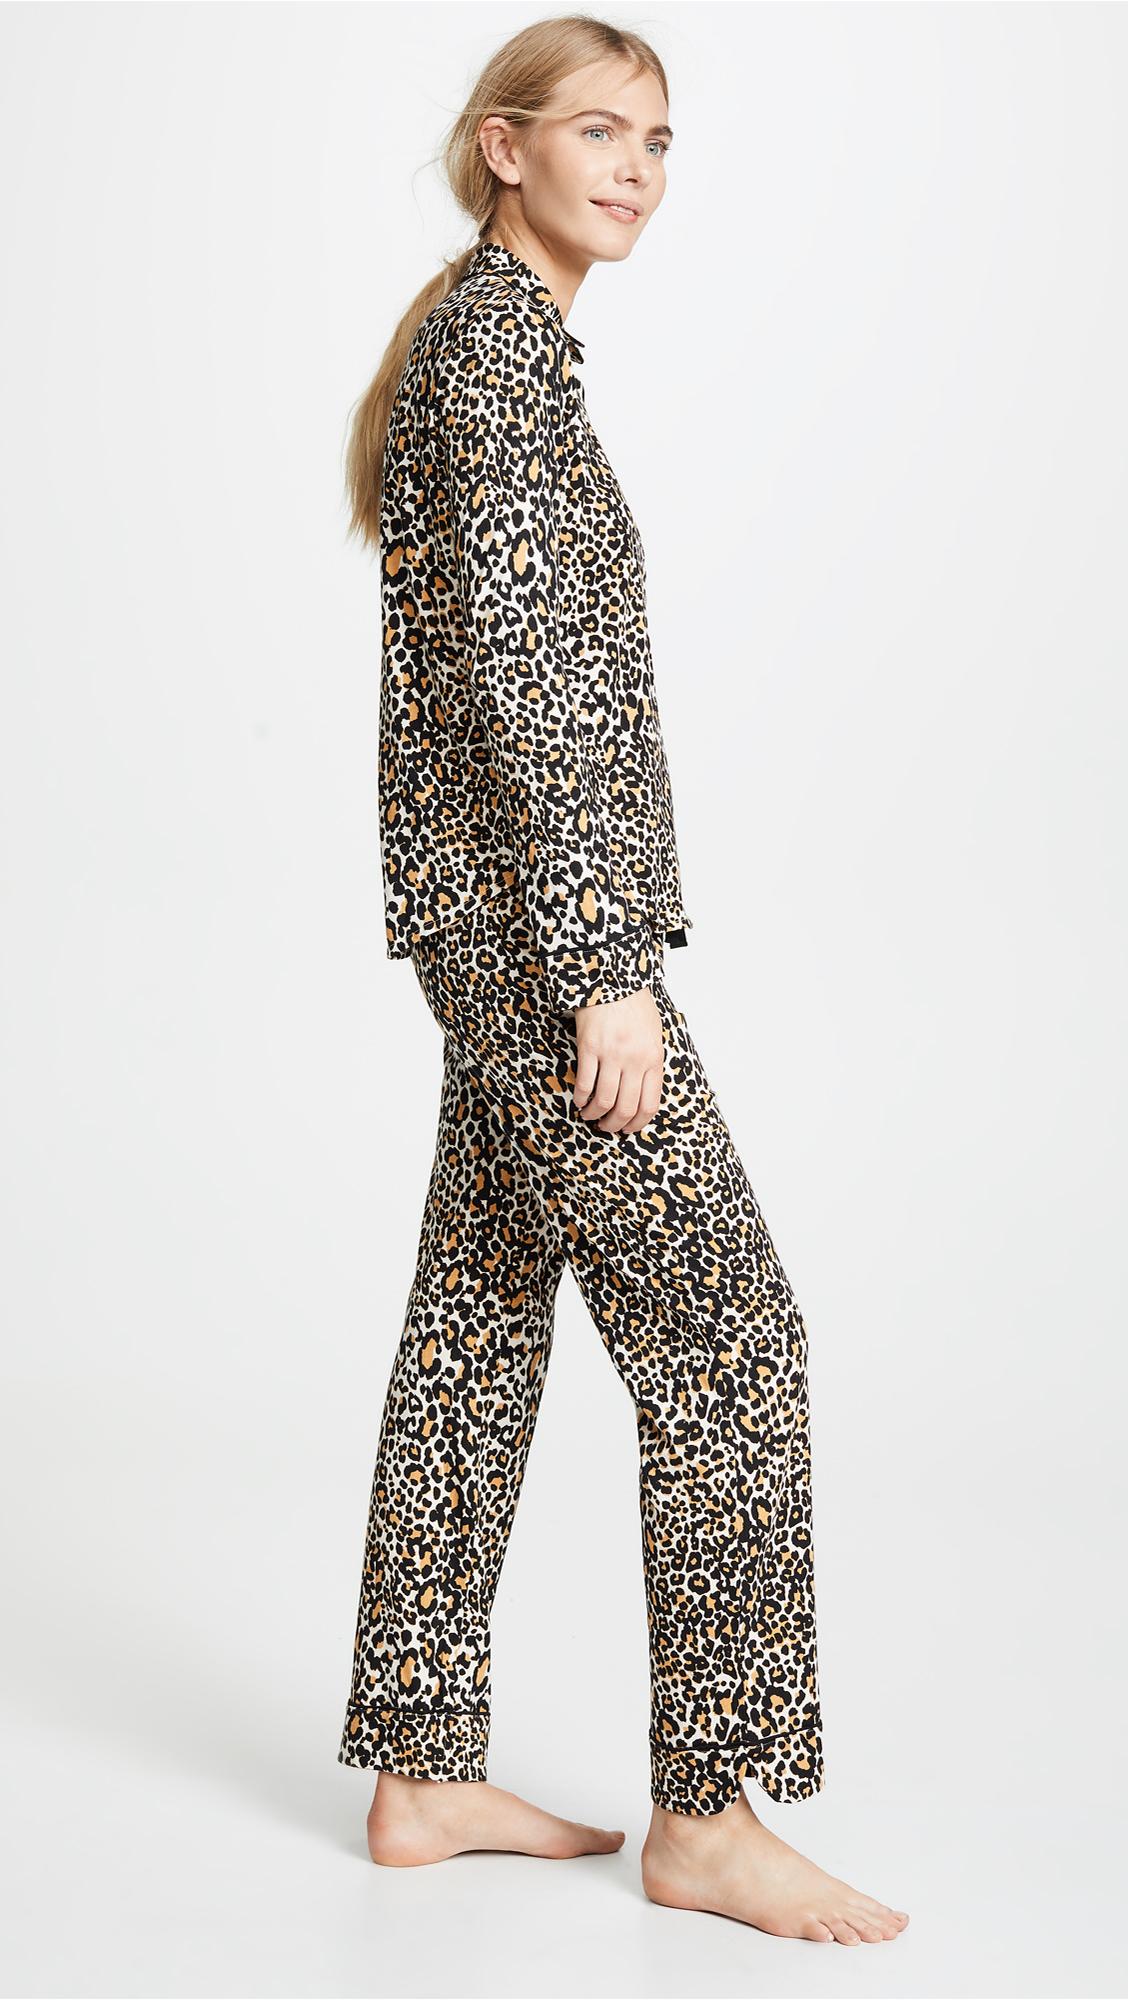 d2e2533535c PJ Salvage Give Love Cheetah Printed PJ Set